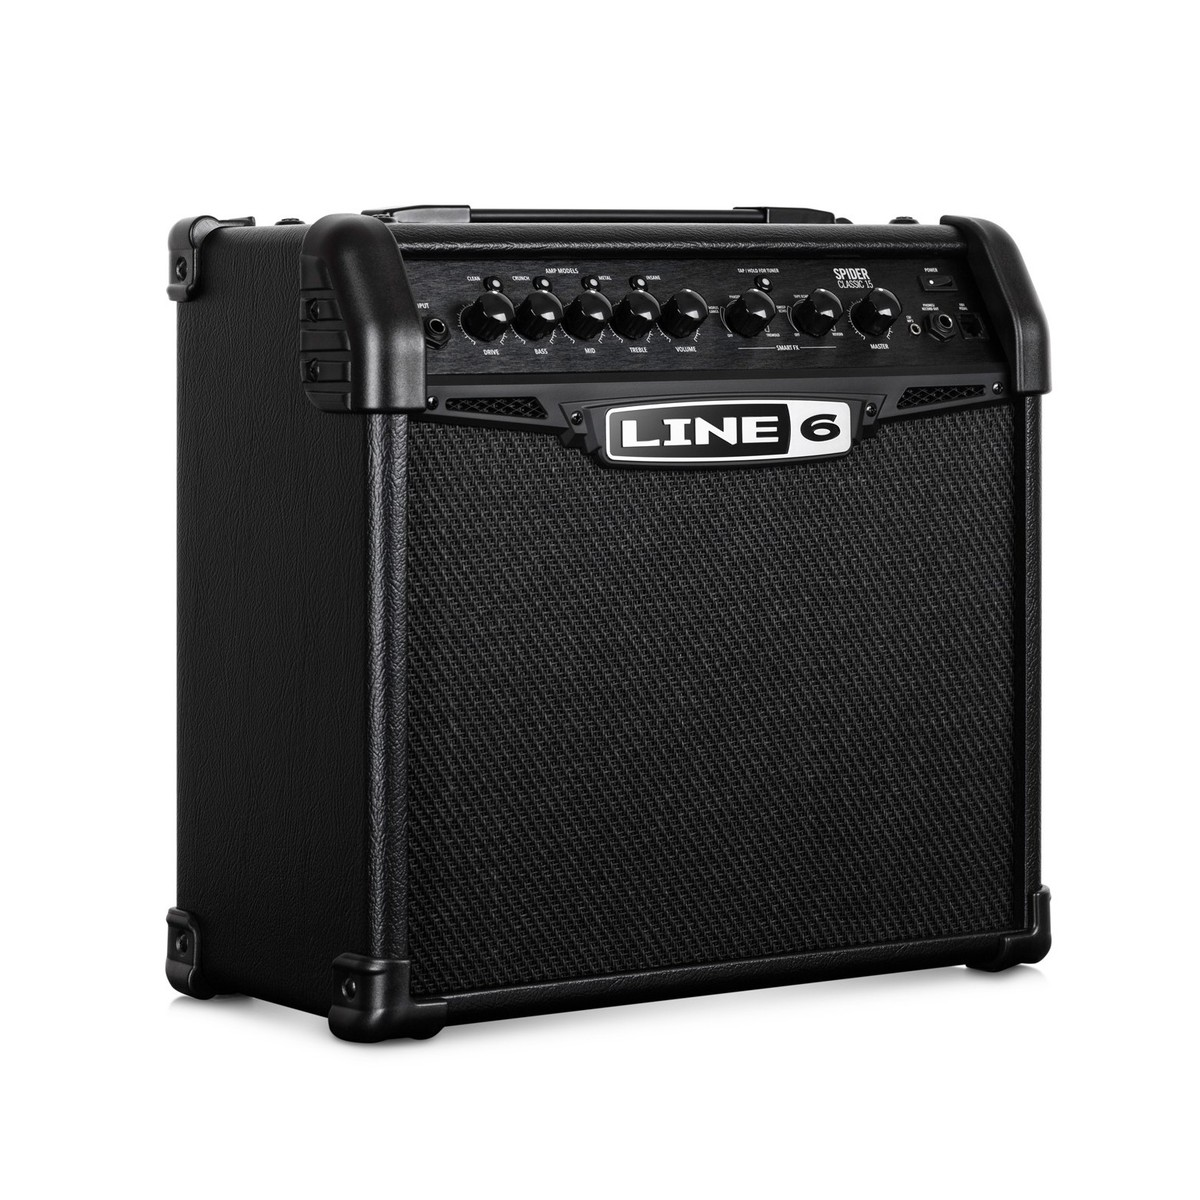 line 6 spider classic 15 guitar combo amp at. Black Bedroom Furniture Sets. Home Design Ideas